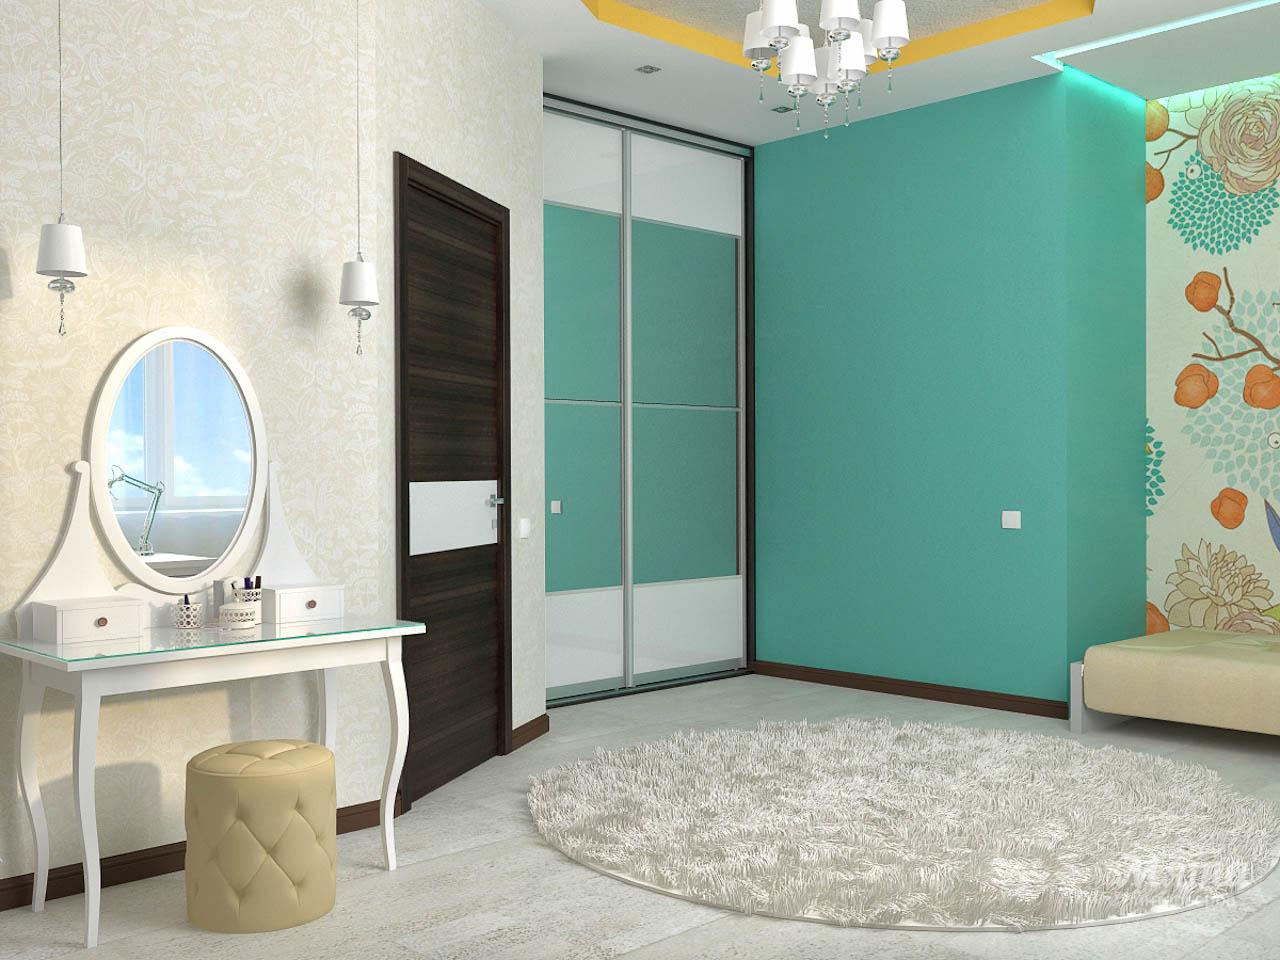 Дизайн проект интерьера коттеджа  в стиле минимализм по ул. Барвинка 15 img431293178